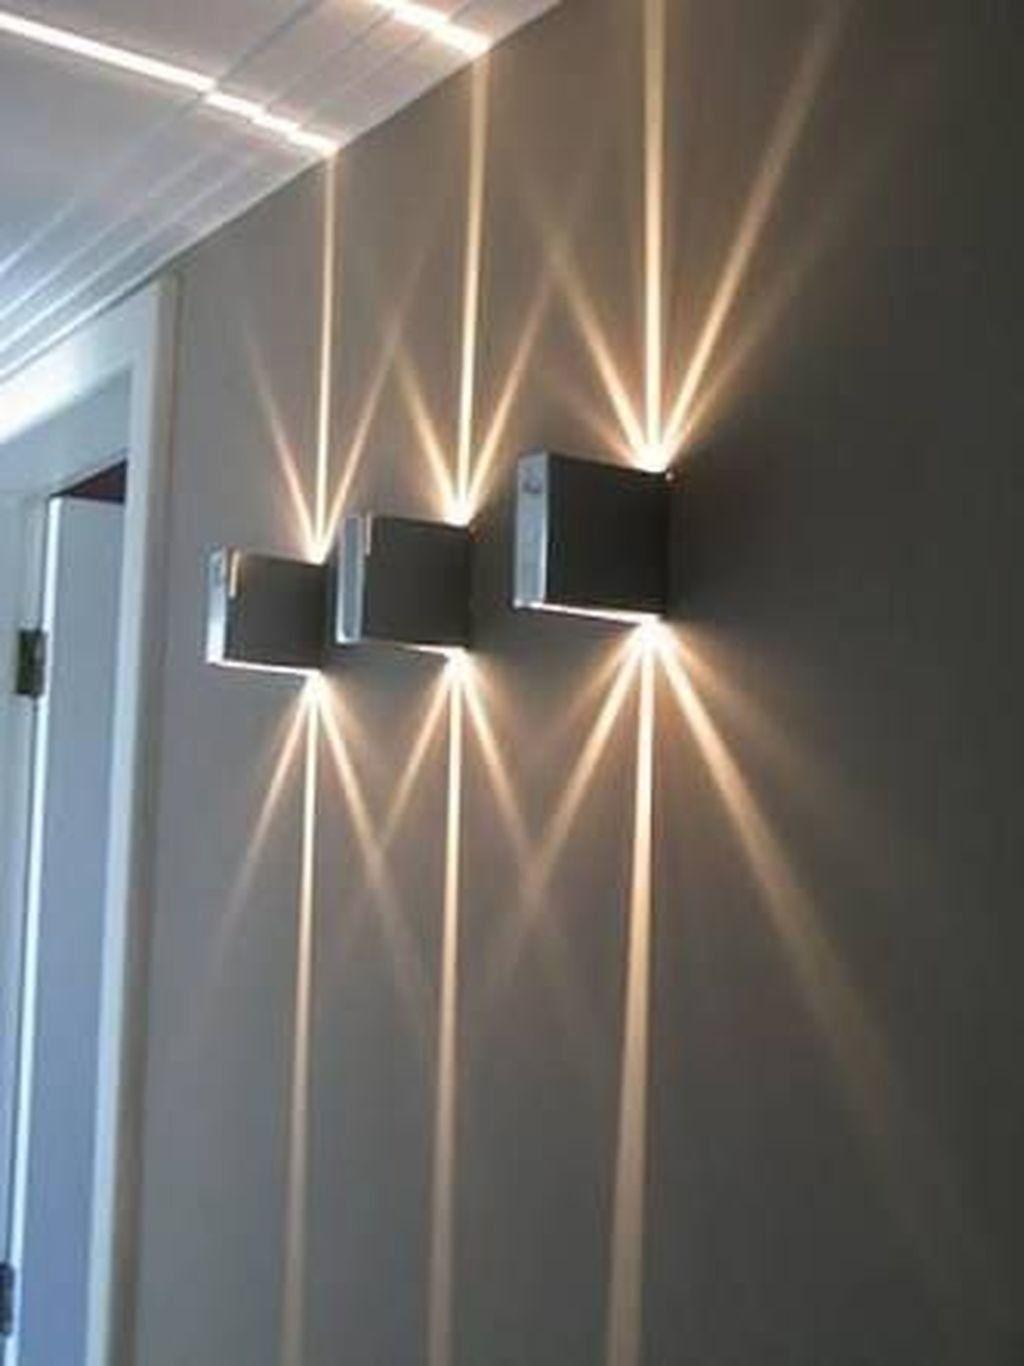 Ldg 2 Lighting Design Guide For Vertical Surfaces Lighting